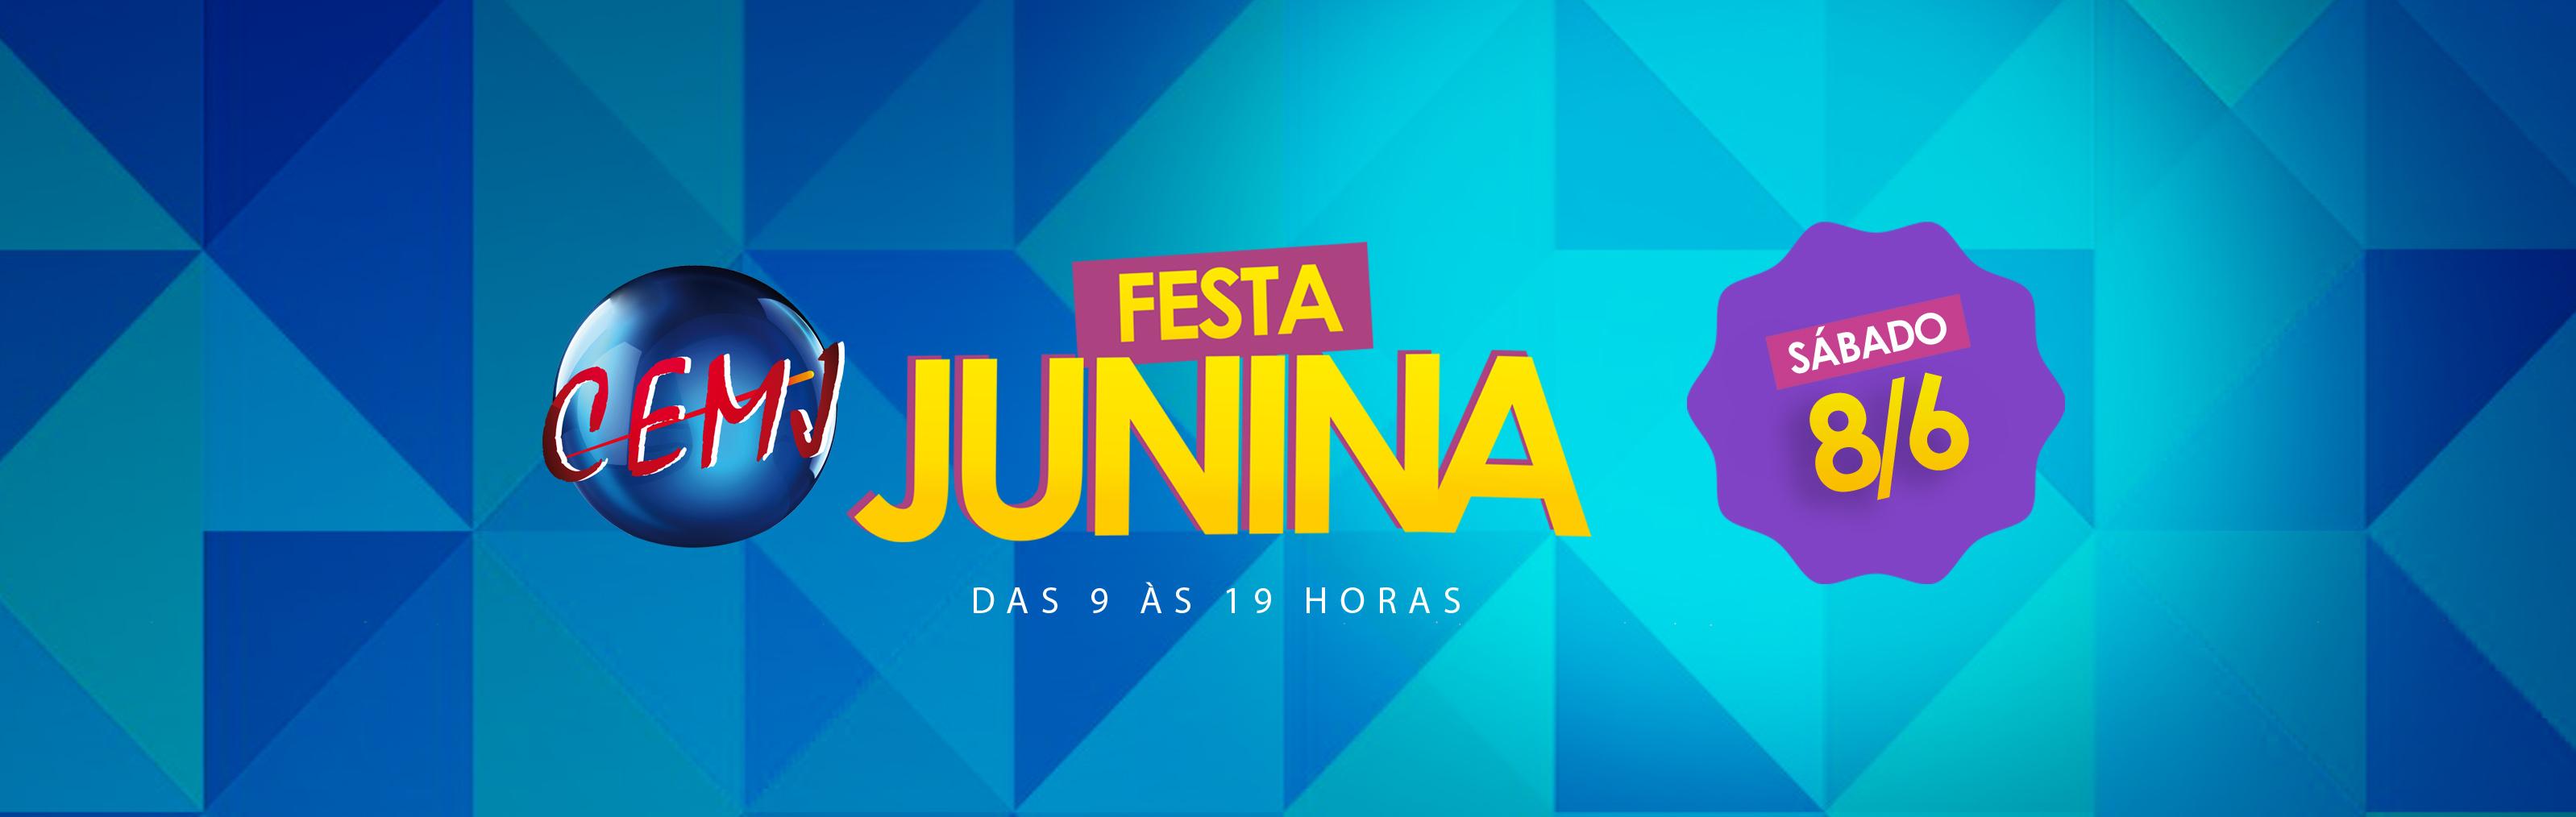 BannerSiteFestaJunina20191